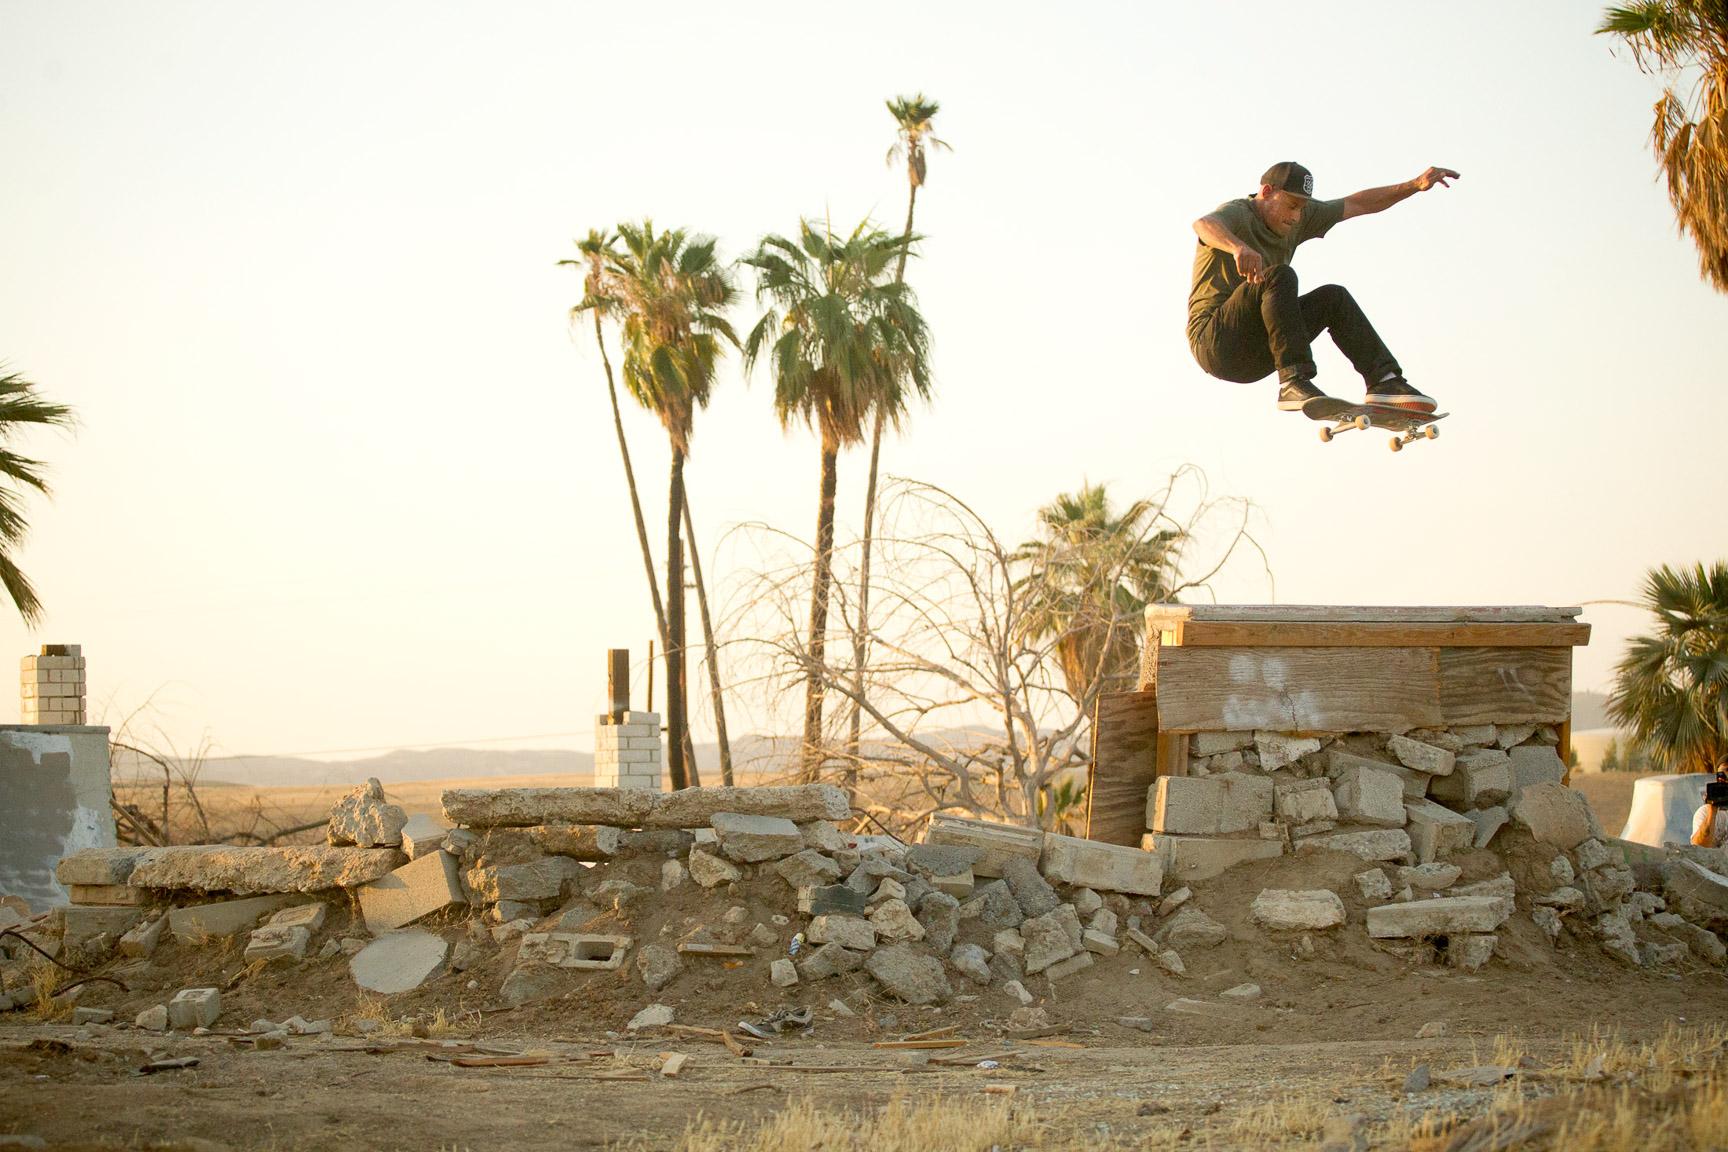 Omar Hassan, Bakersfield, California